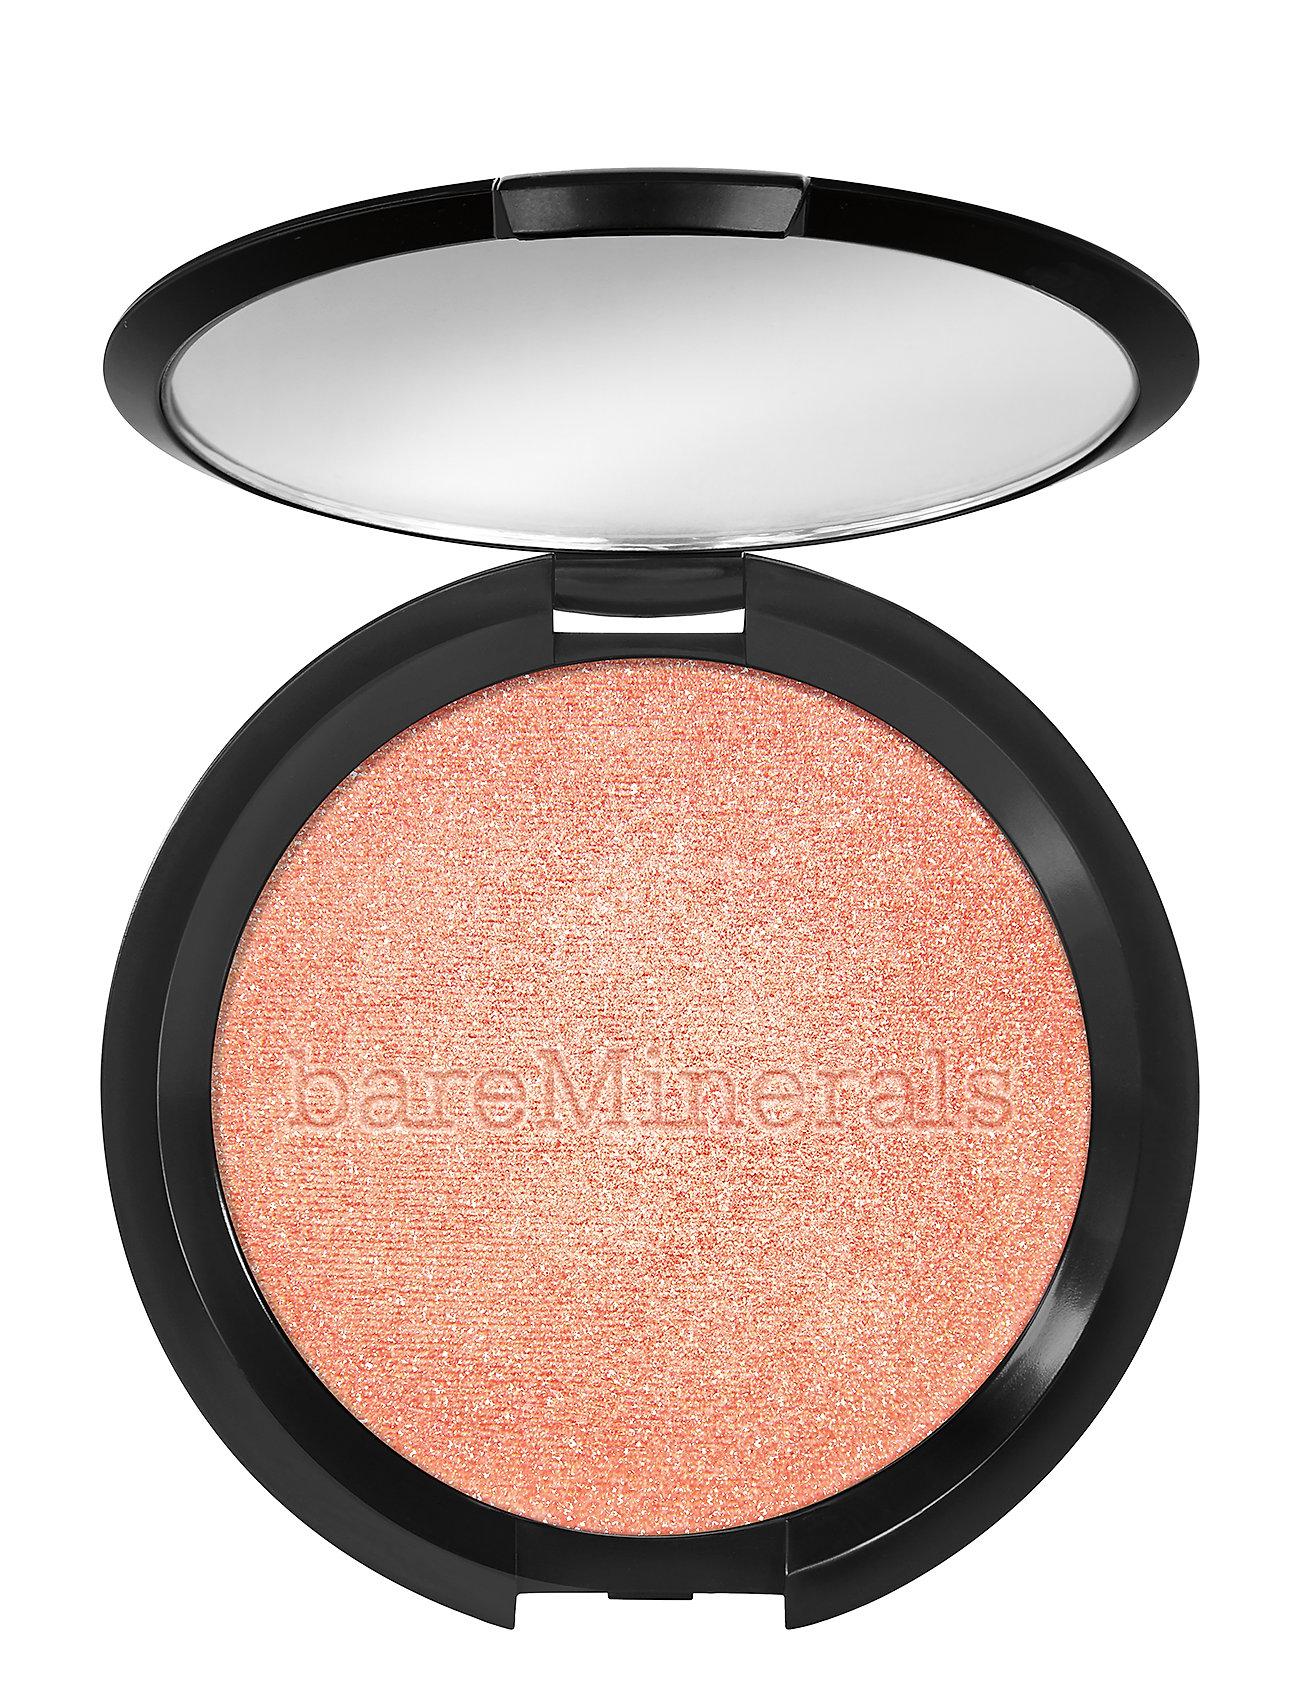 Image of Endless Glow Highlighter Joy Highlighter Contour Makeup Multi/mønstret BareMinerals (3210823289)